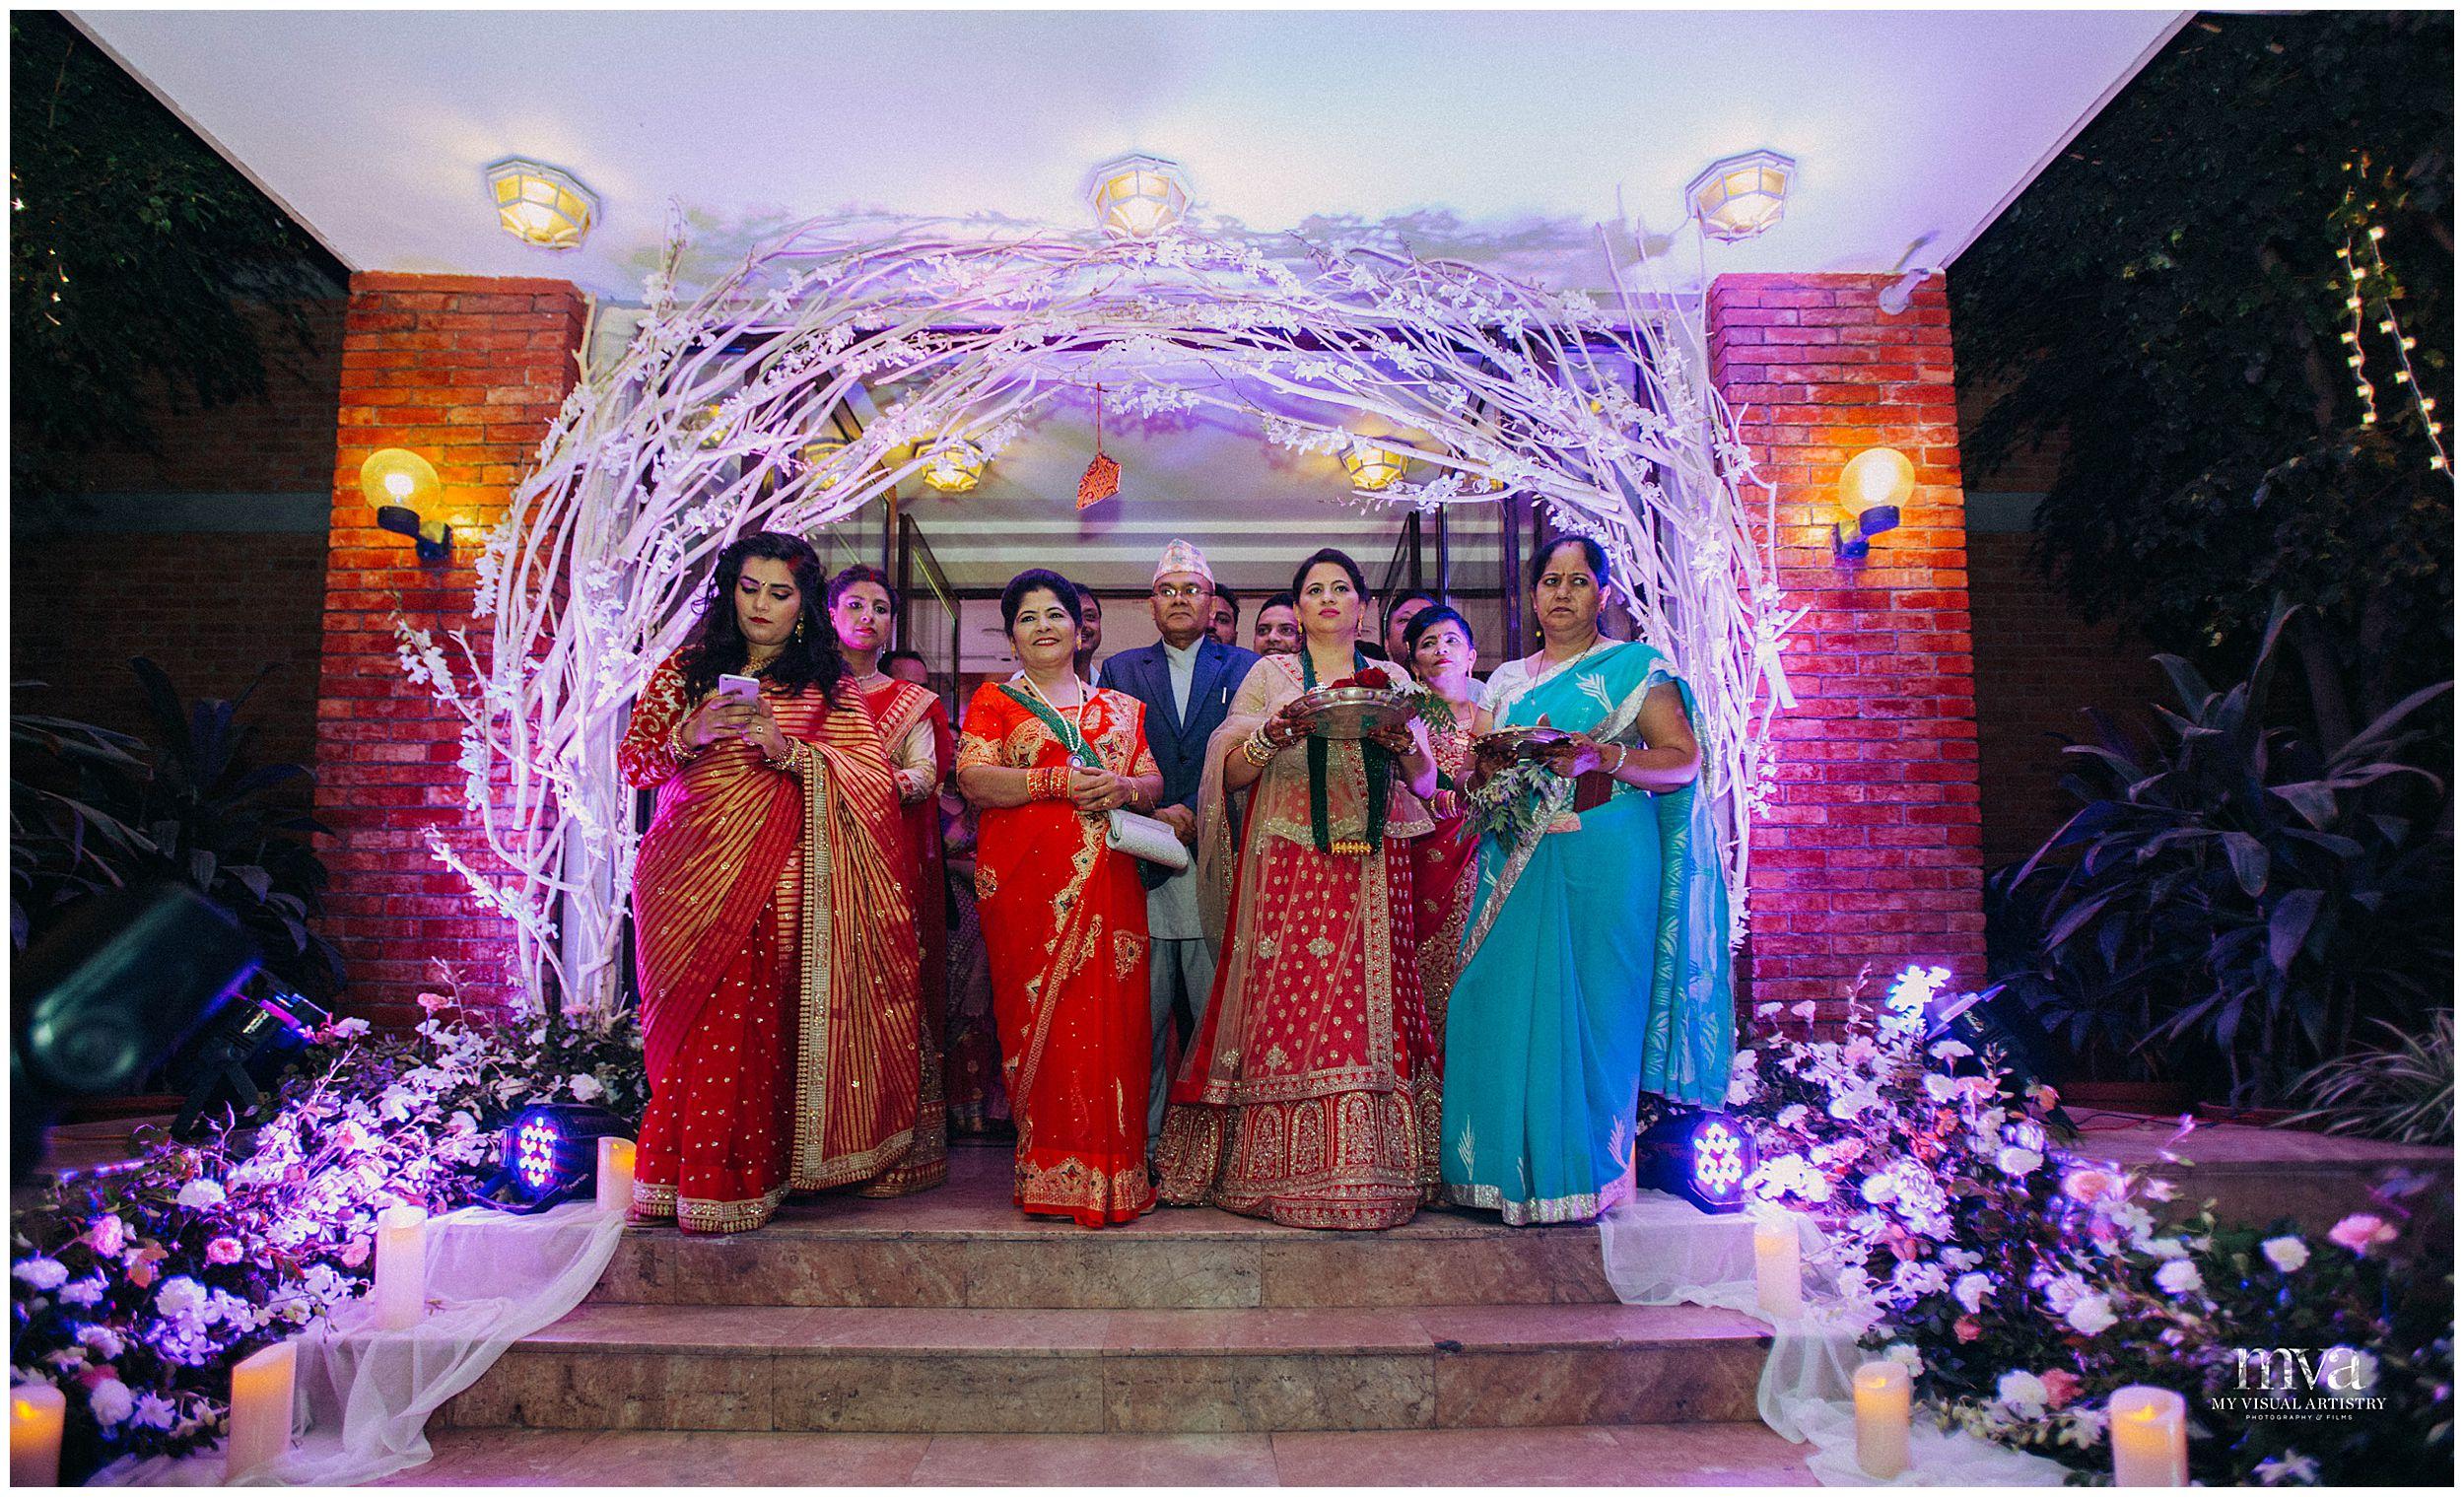 SONAAL_AMI_MYVISUALARTISTRY_WEDDING_PHOTOGRAPHY_MVA_NEPAL_KATHMANDU_SOALTEE40.jpg